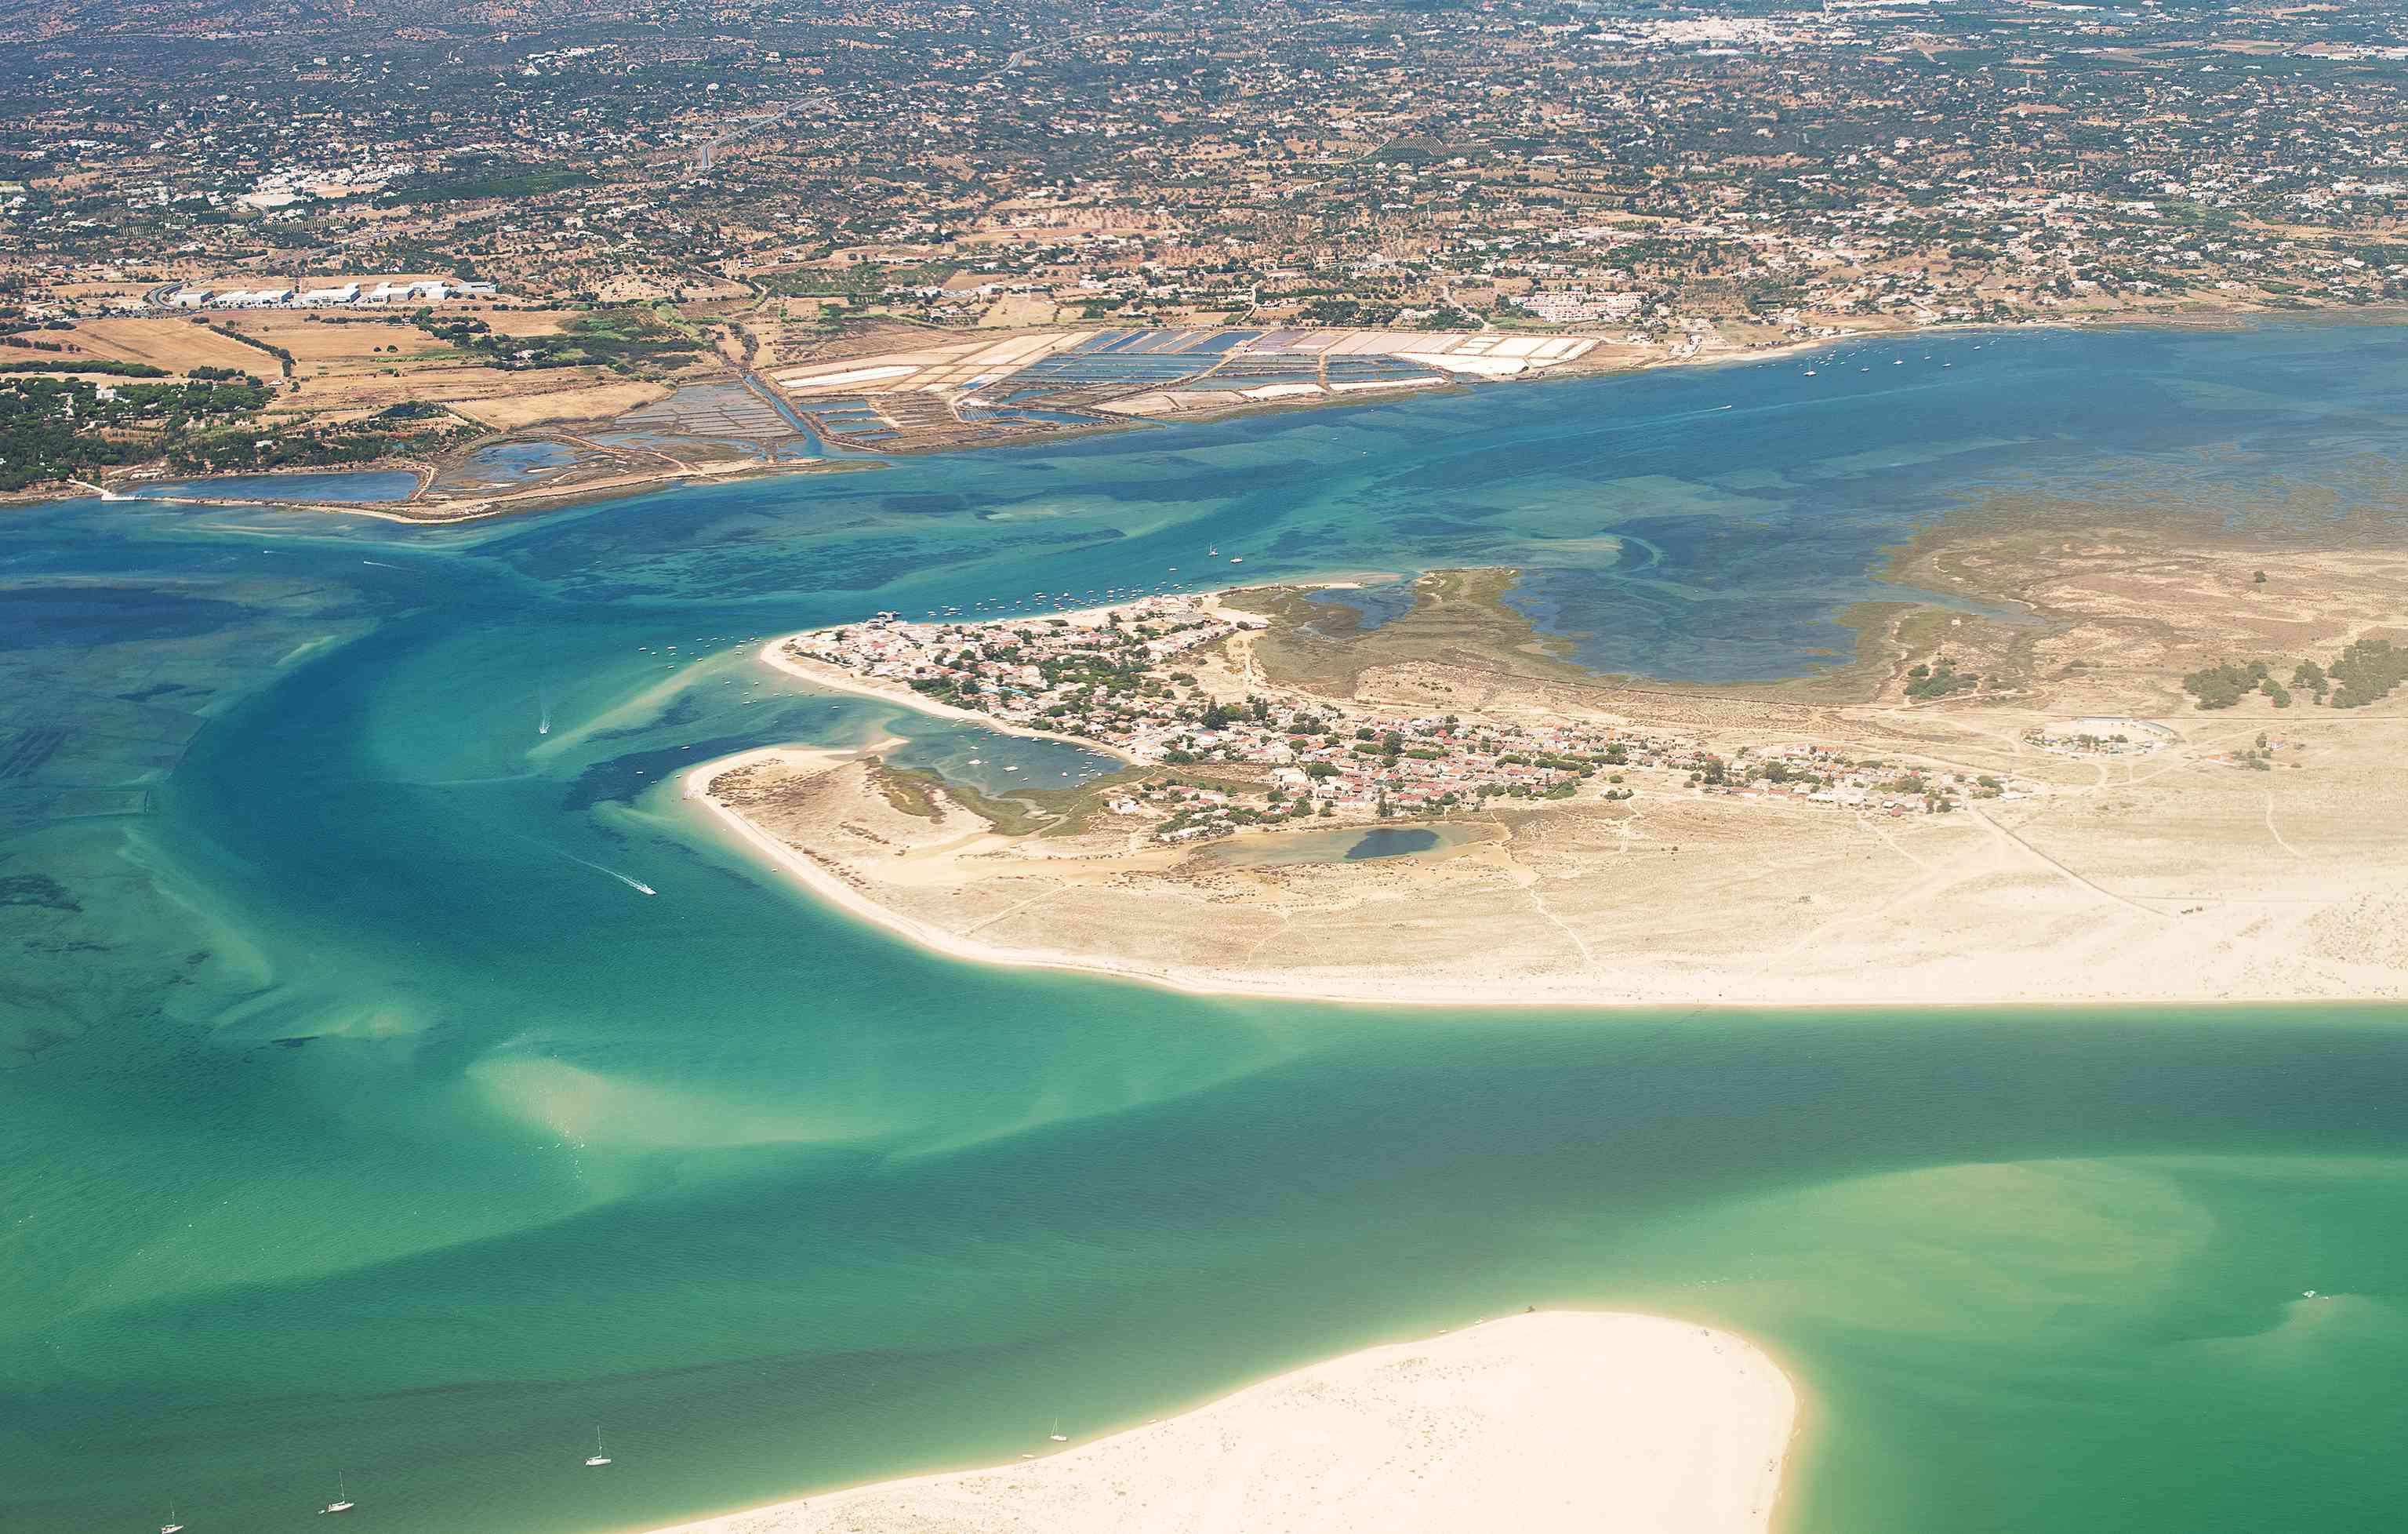 Aerial view of Armona Island, Algarve, Portugal.